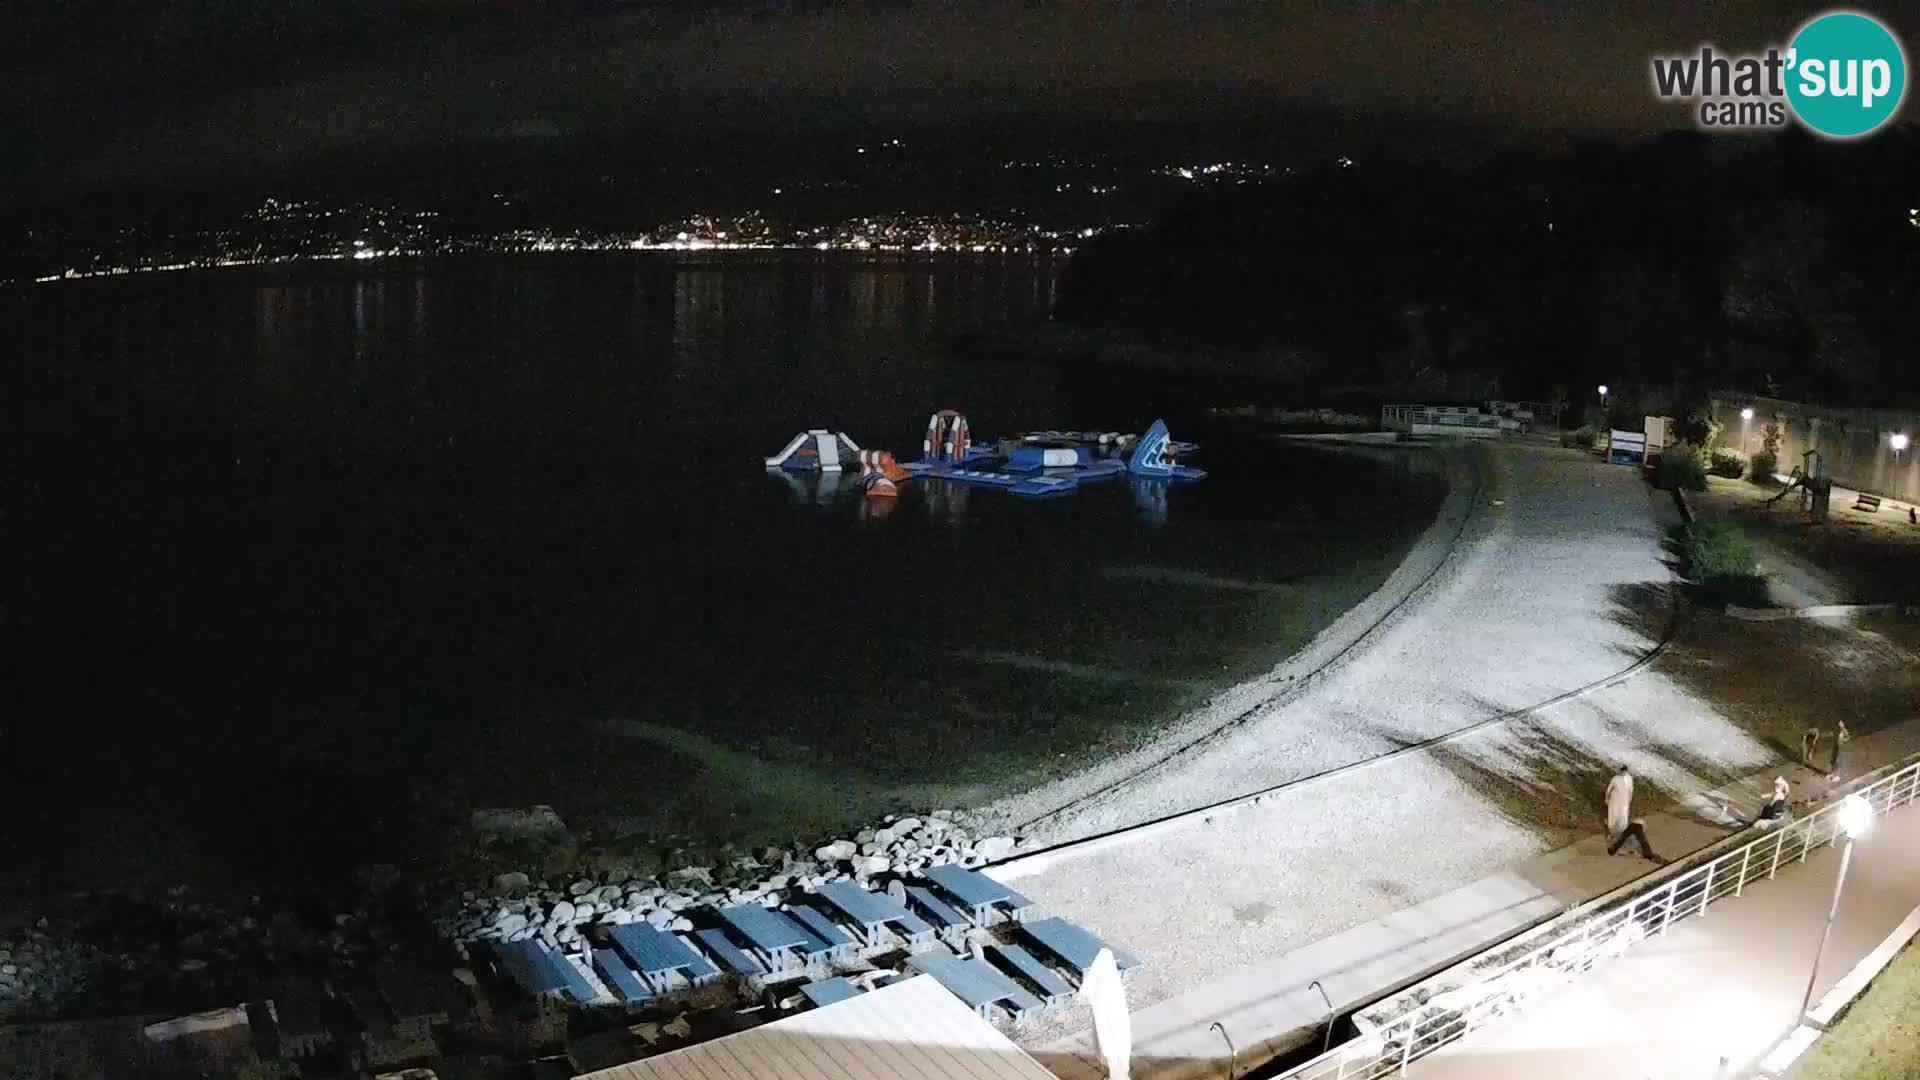 Rijeka Camera en vivo playa piscinas Kantrida